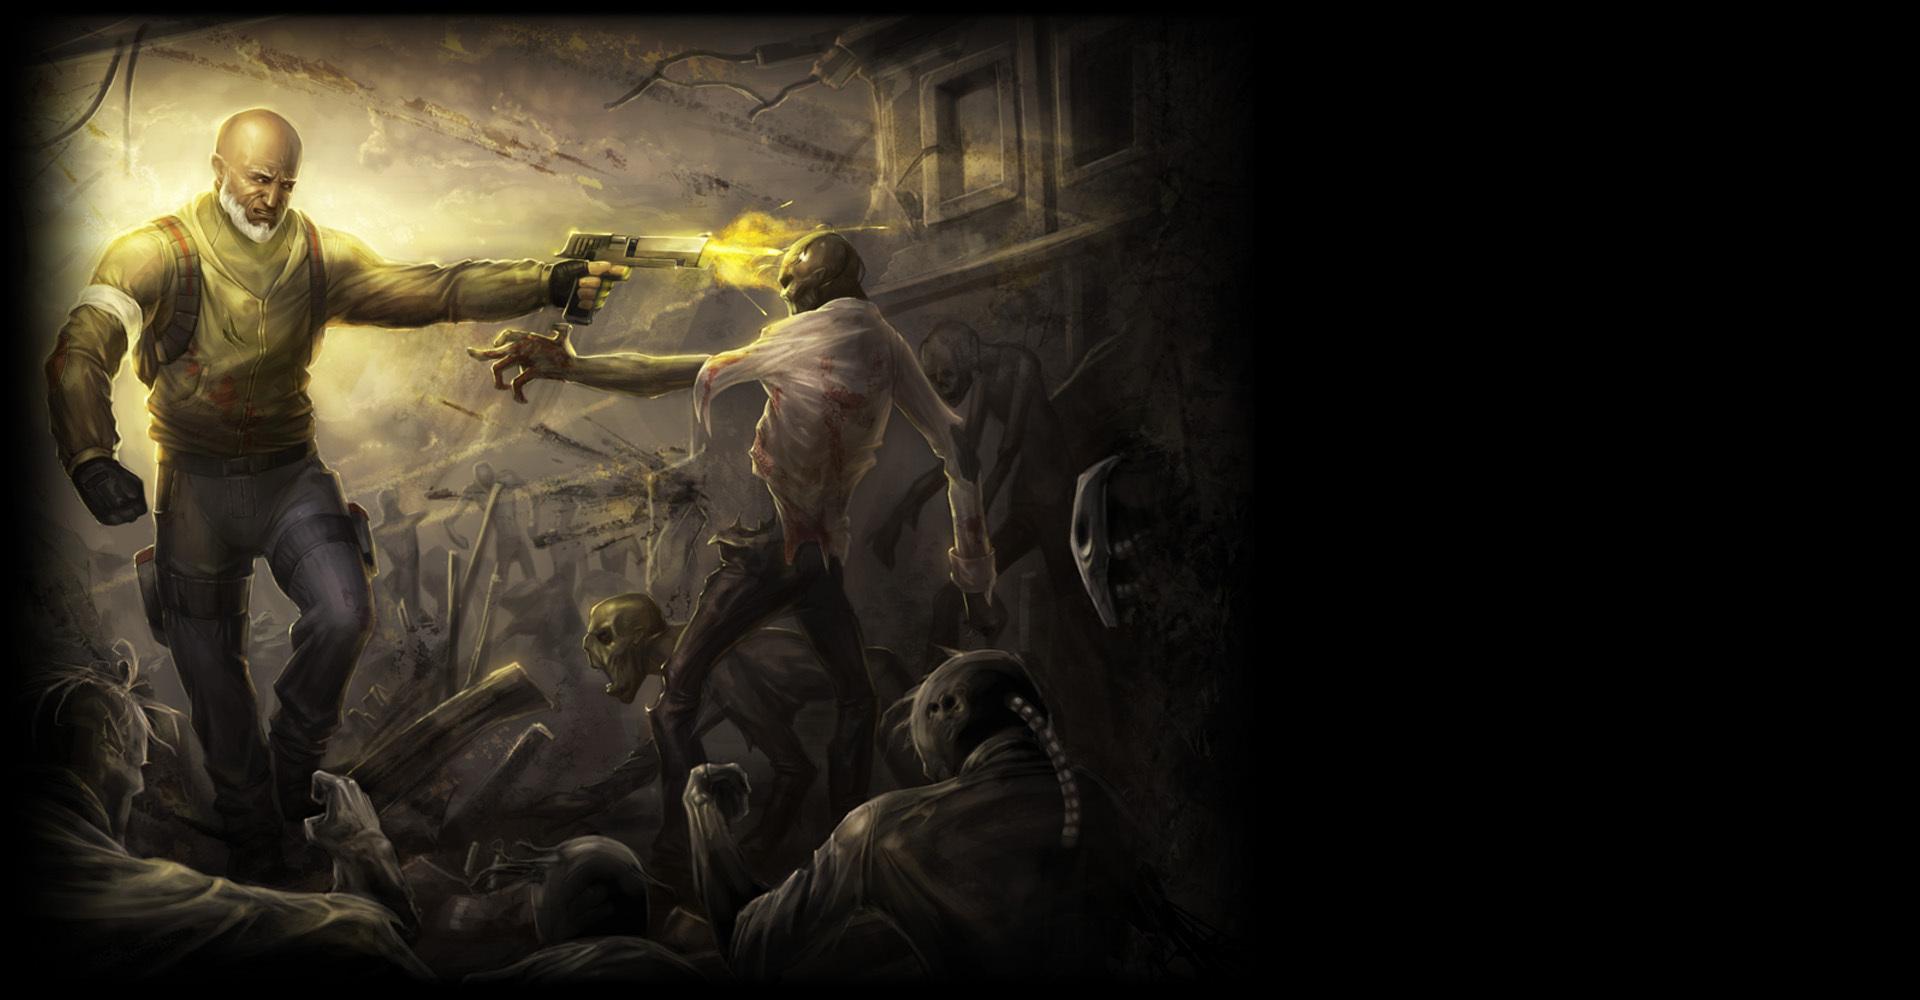 Nice wallpapers Guns'N'Zombies 1920x1000px